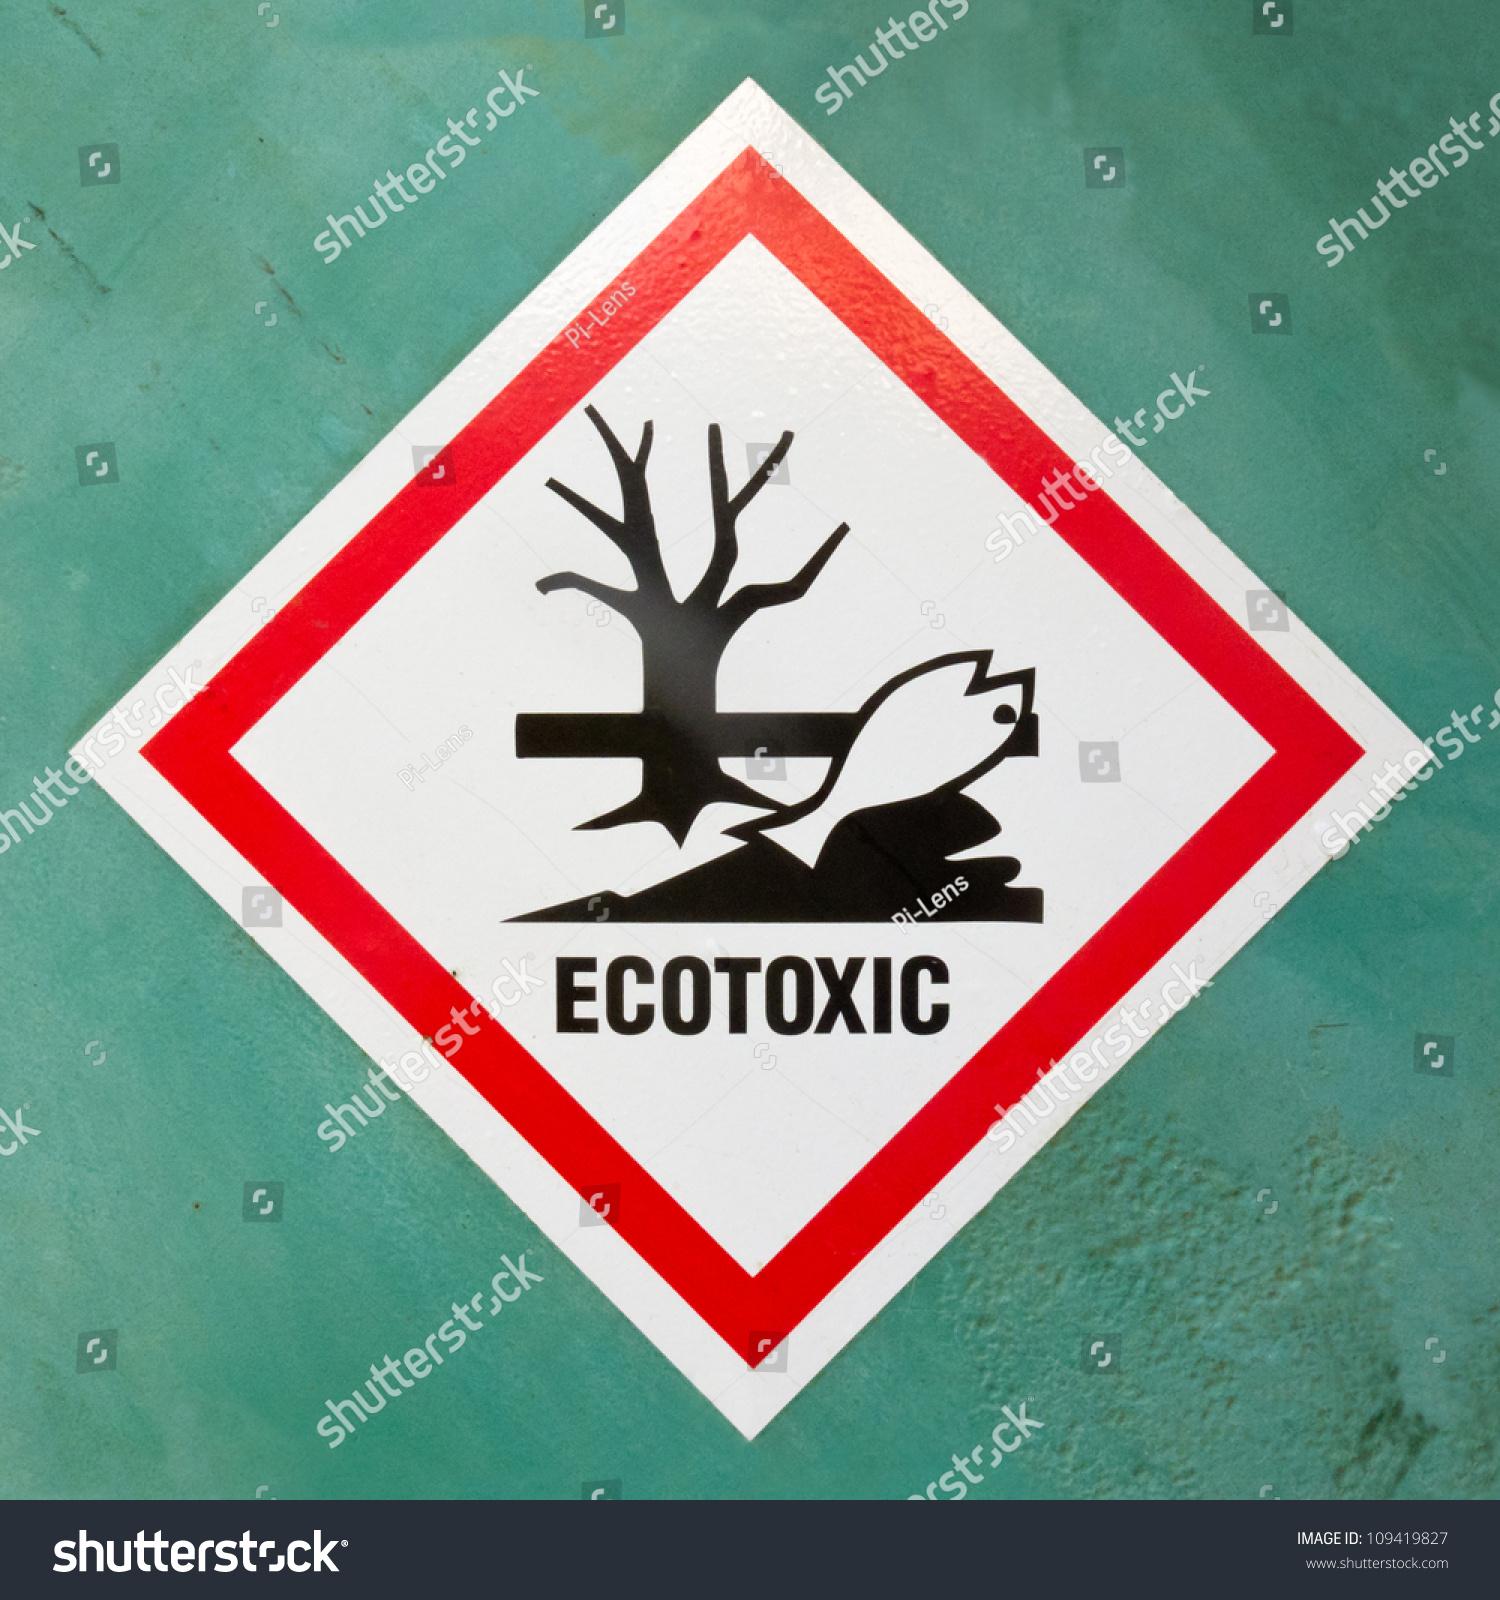 Environment hazard symbol view symbol buycottarizona